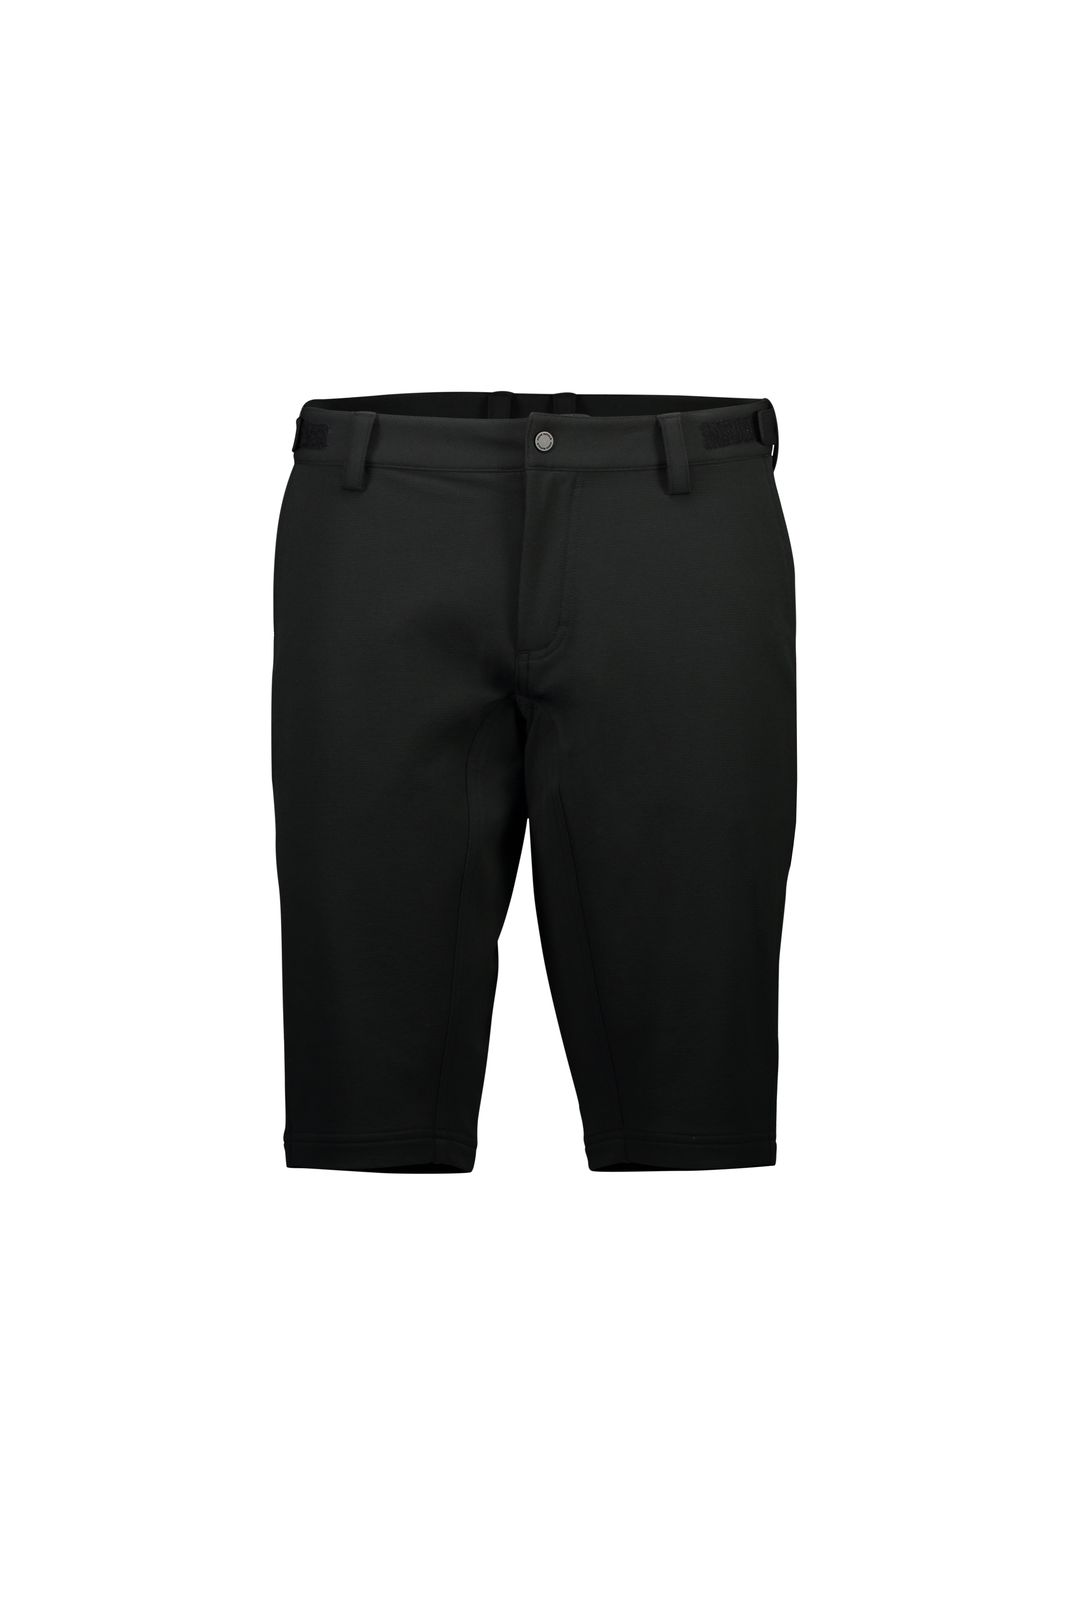 MONS ROYALE Momentum Bike Shorts - Cykelshorts - Sort | Trousers